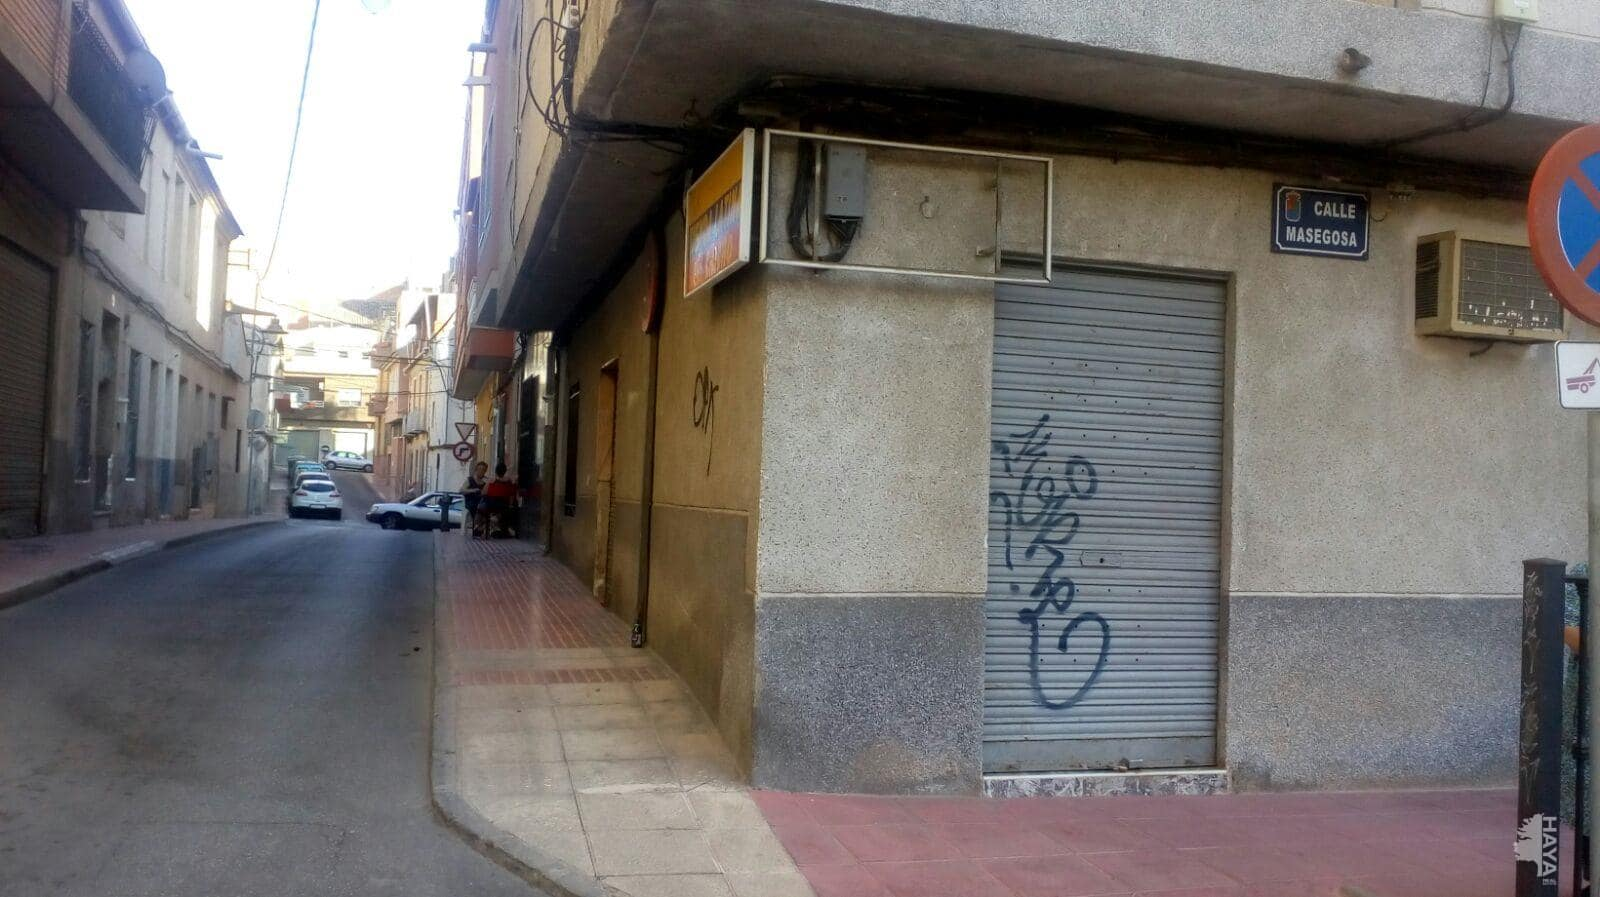 Local en venta en Molina de Segura, Murcia, Calle Masegosa, 34.000 €, 53 m2